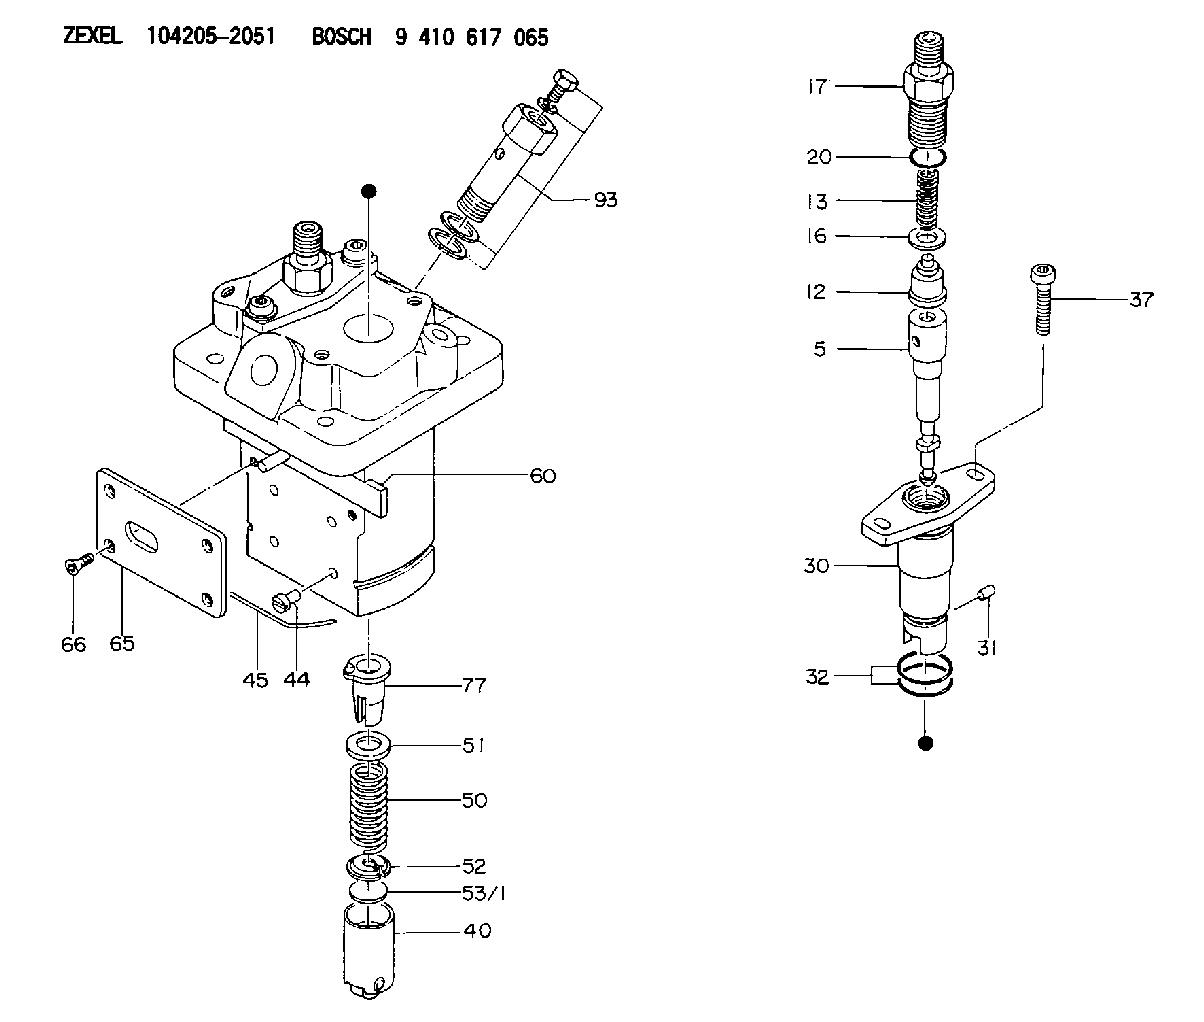 Zexel Injection Pump Wiring Diagram Wiring Diagram – Injection Pump Wiring Diagram